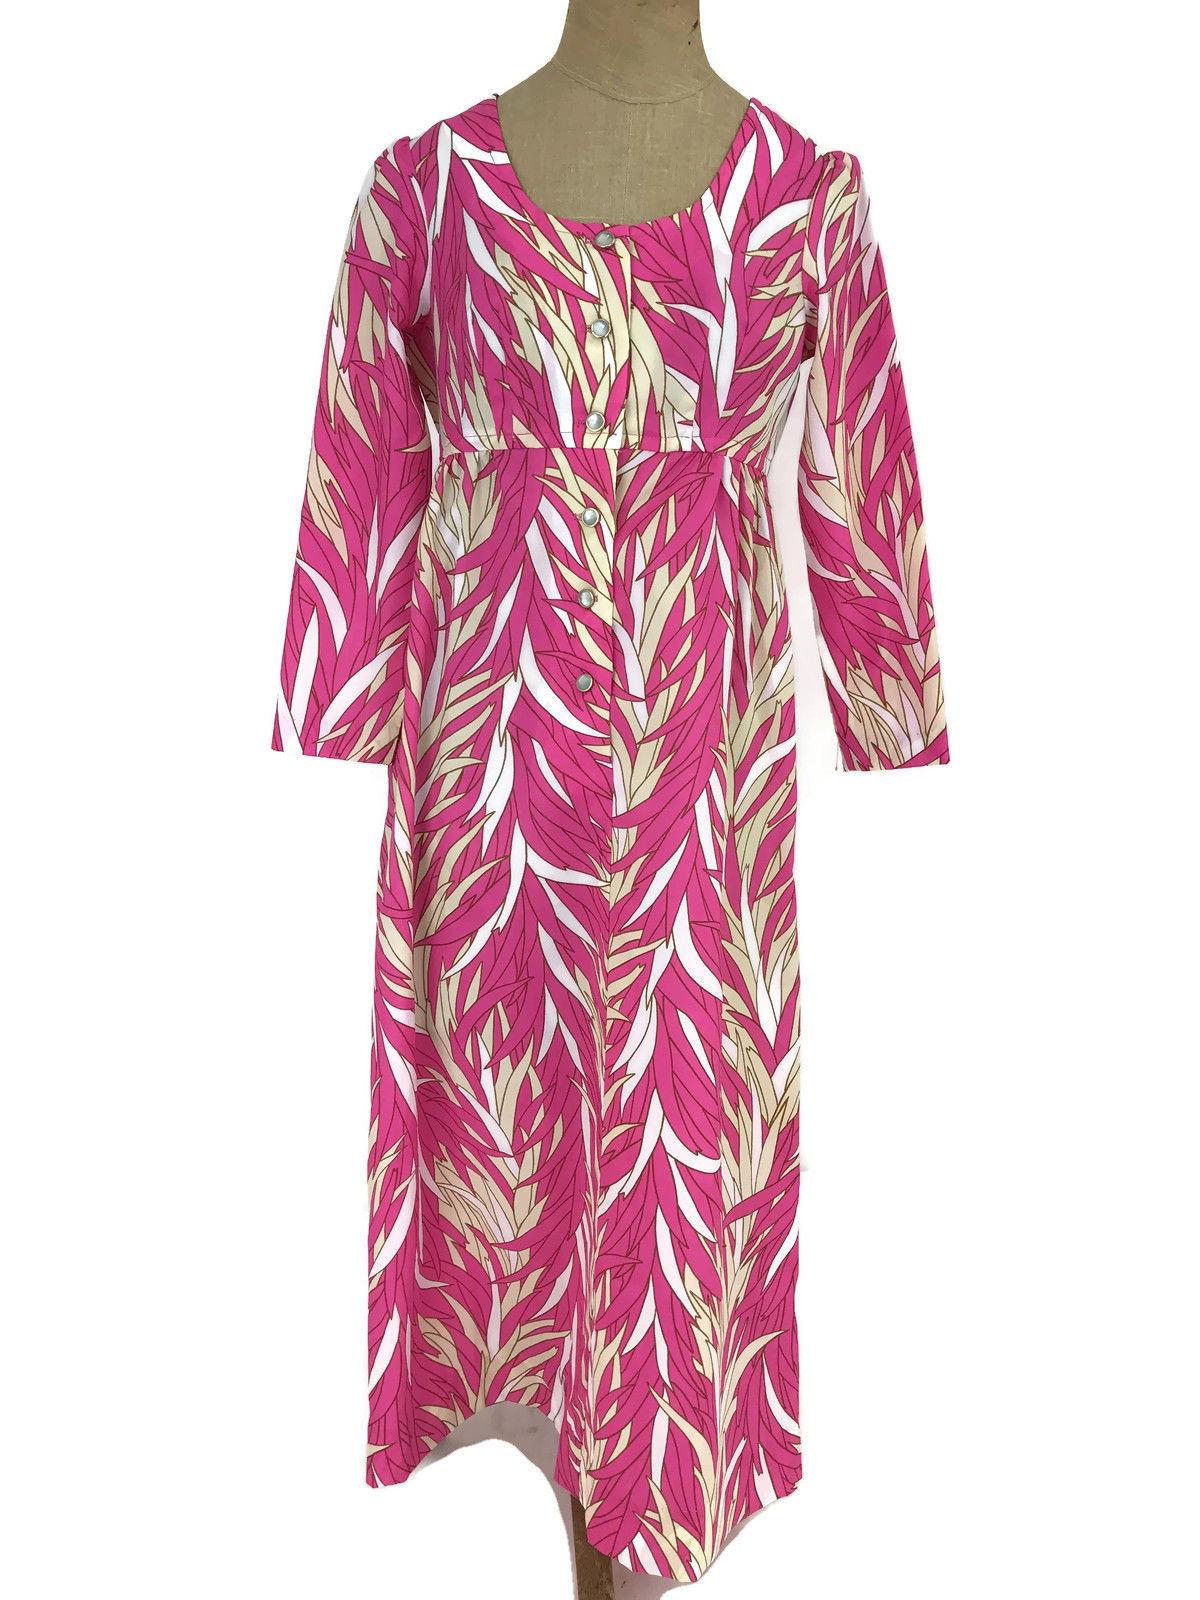 dbc4a165406b S l1600. S l1600. Previous. Vintage Ca. 1970s Sears Hawaiian Fashions  Women's Dress Hot Pink Tropical MuuMuu